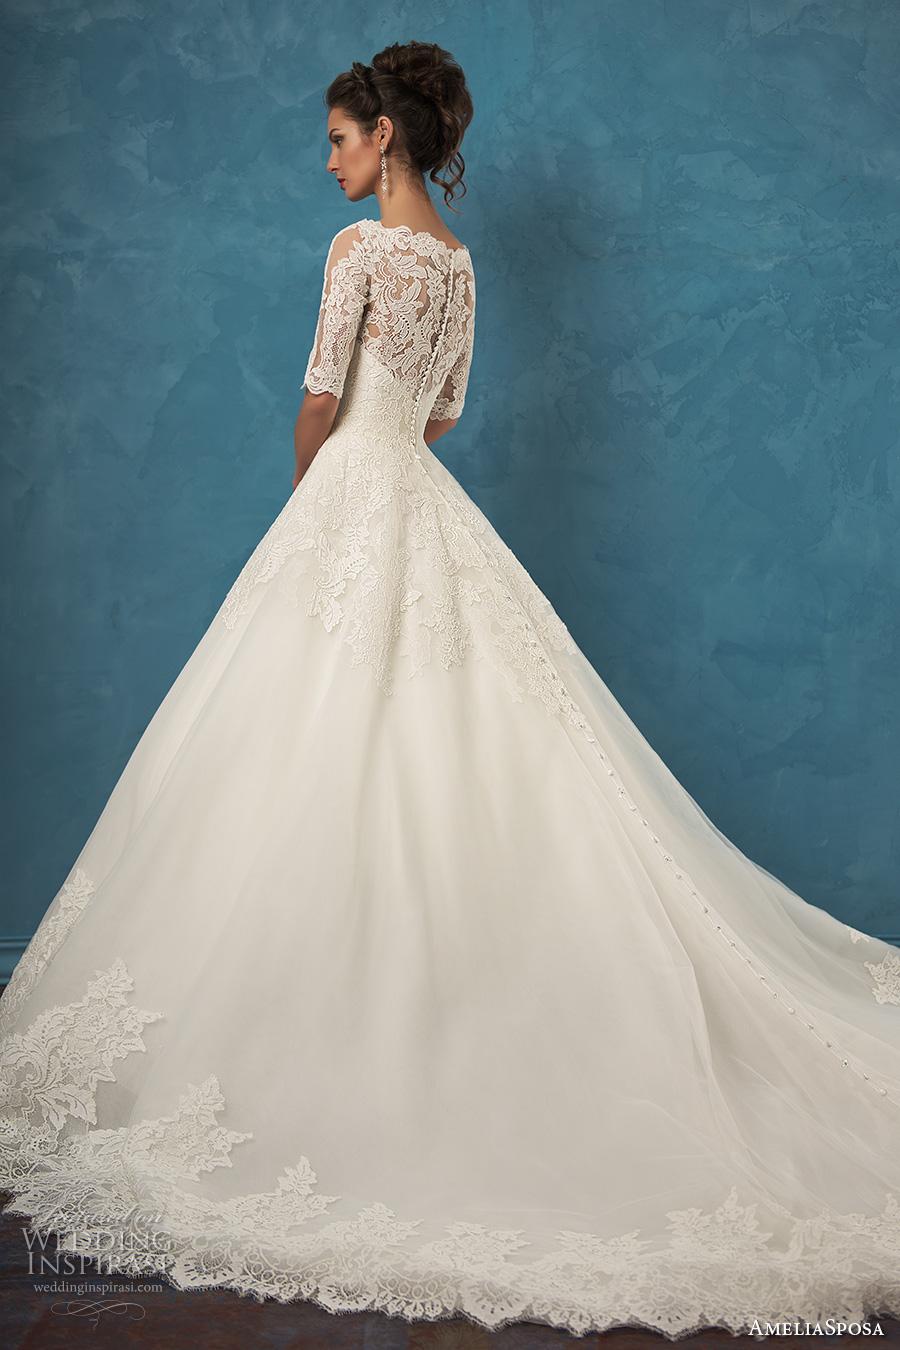 amelia sposa 2017 bridal half sleeves scallop lace v neck heavily embellished bodice romantic a  line wedding dress illusion lace back royal train (patrizia) sdv